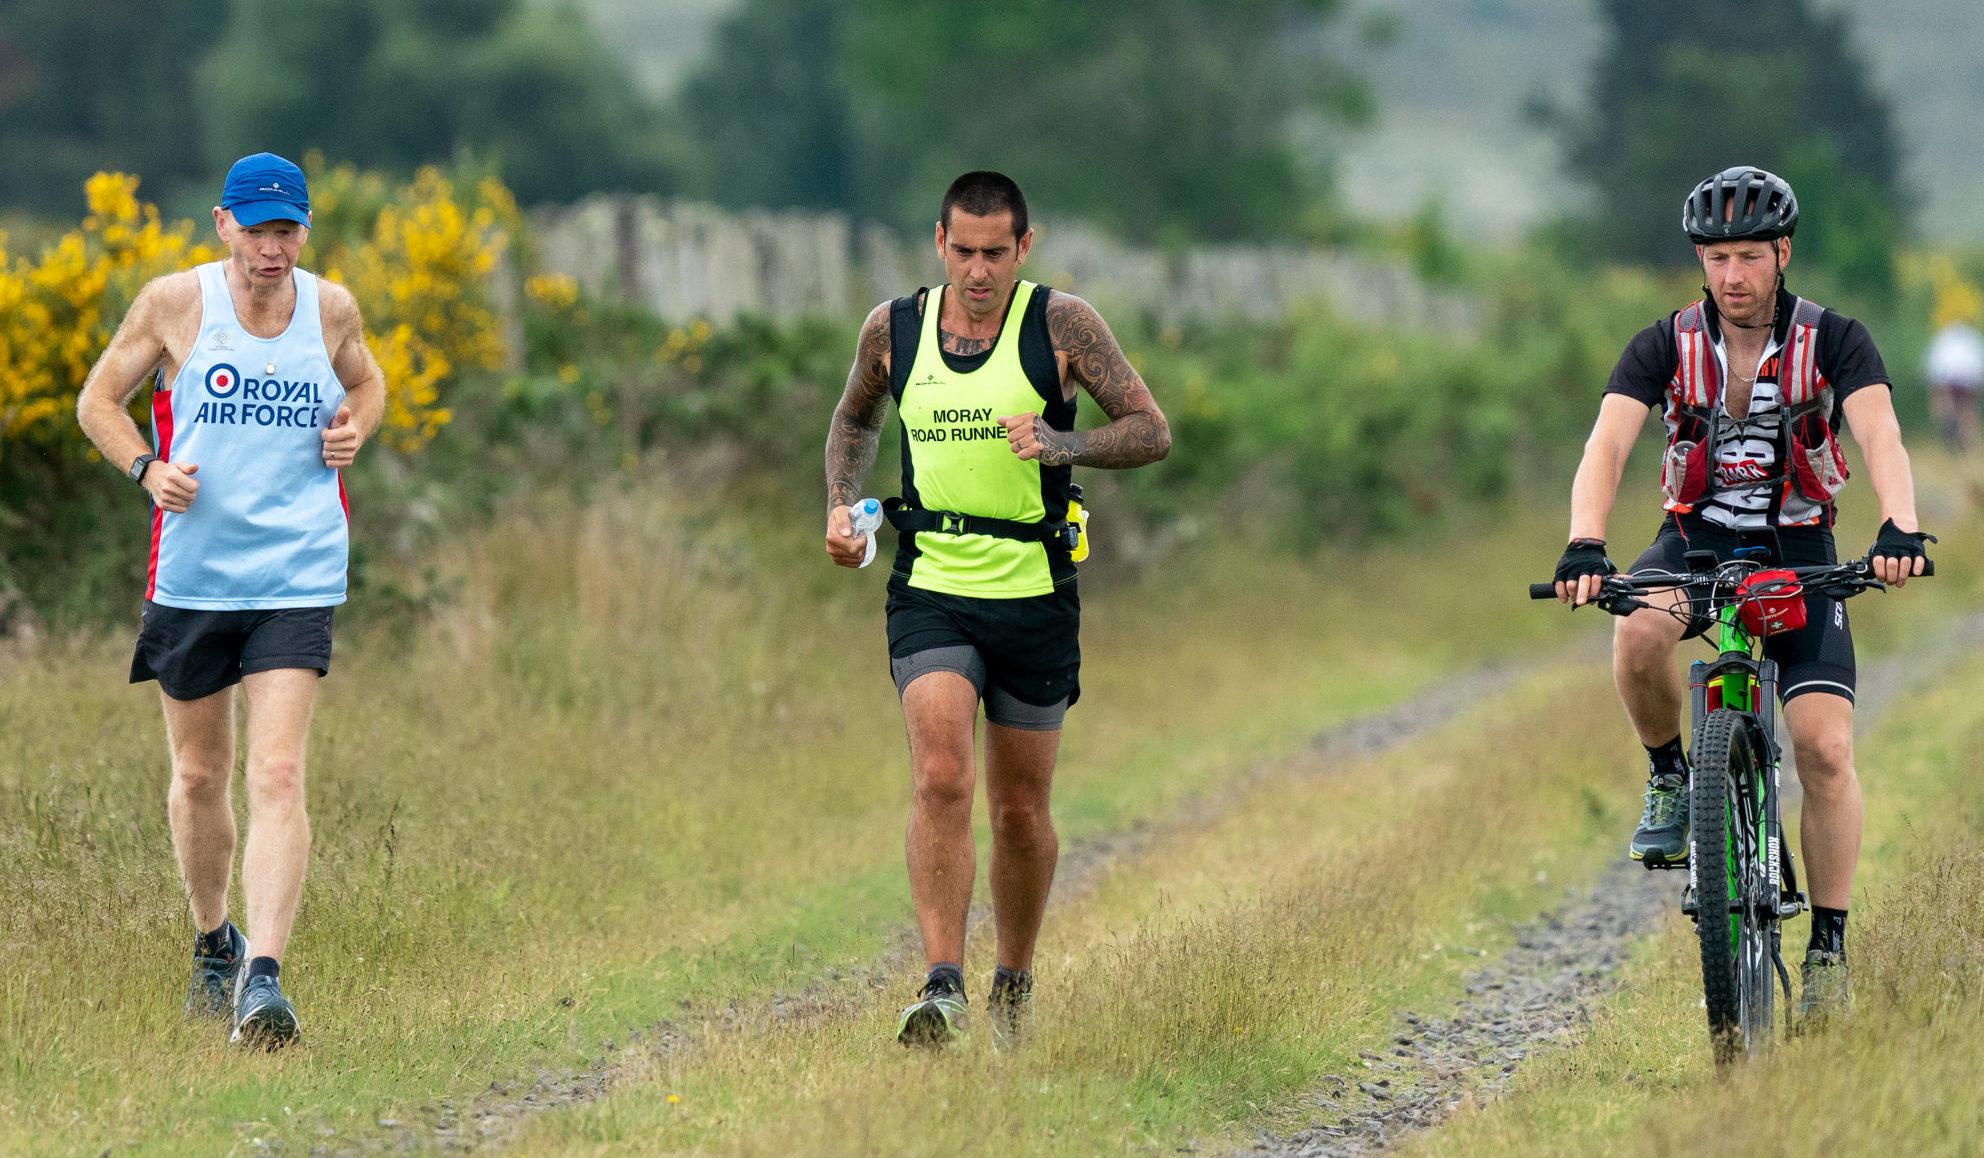 John Anderson, pictured centre, ran 100 miles to remember friend Jon Ward. Pictured left, Gareth Jenkins, right, Steven Morrison.